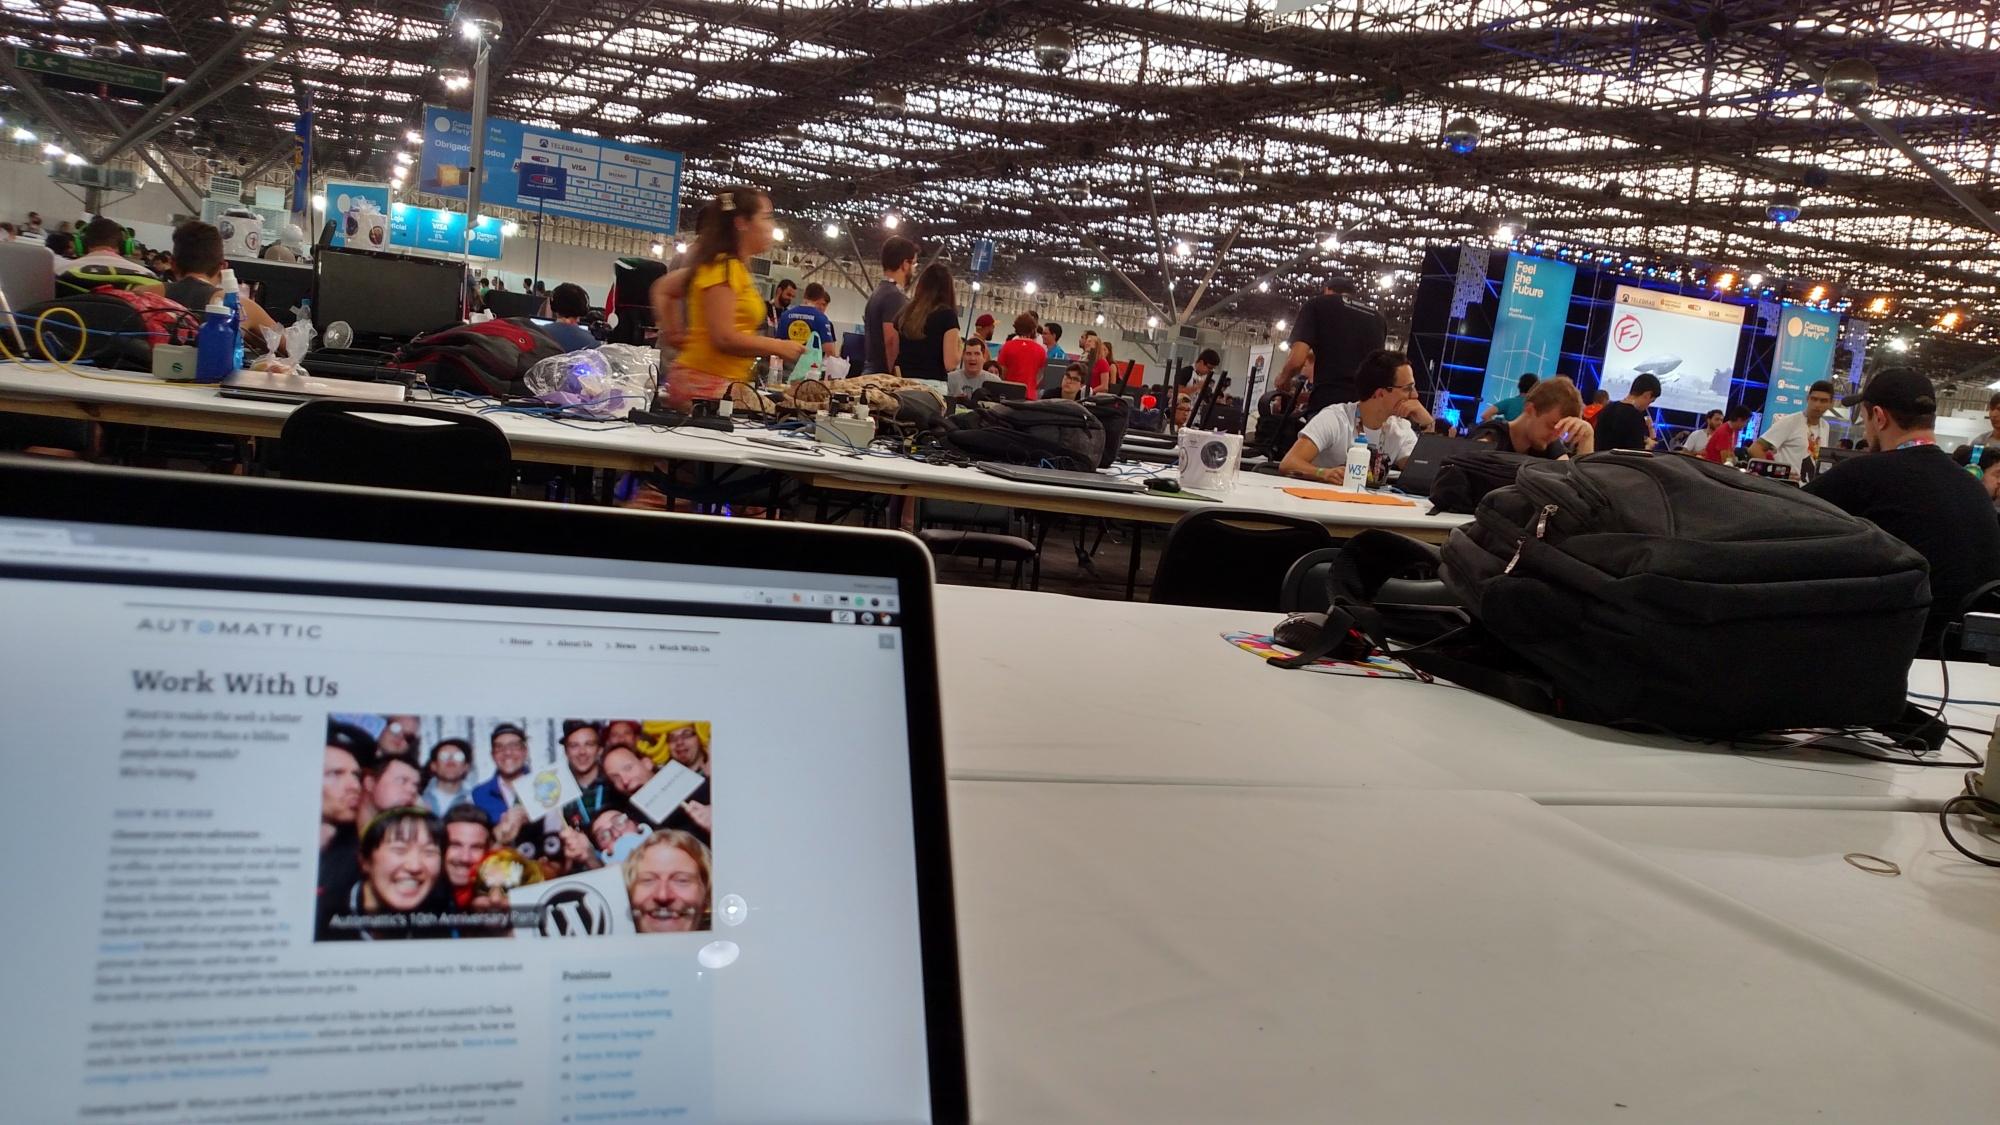 Campus Party, São Paulo, Brazil